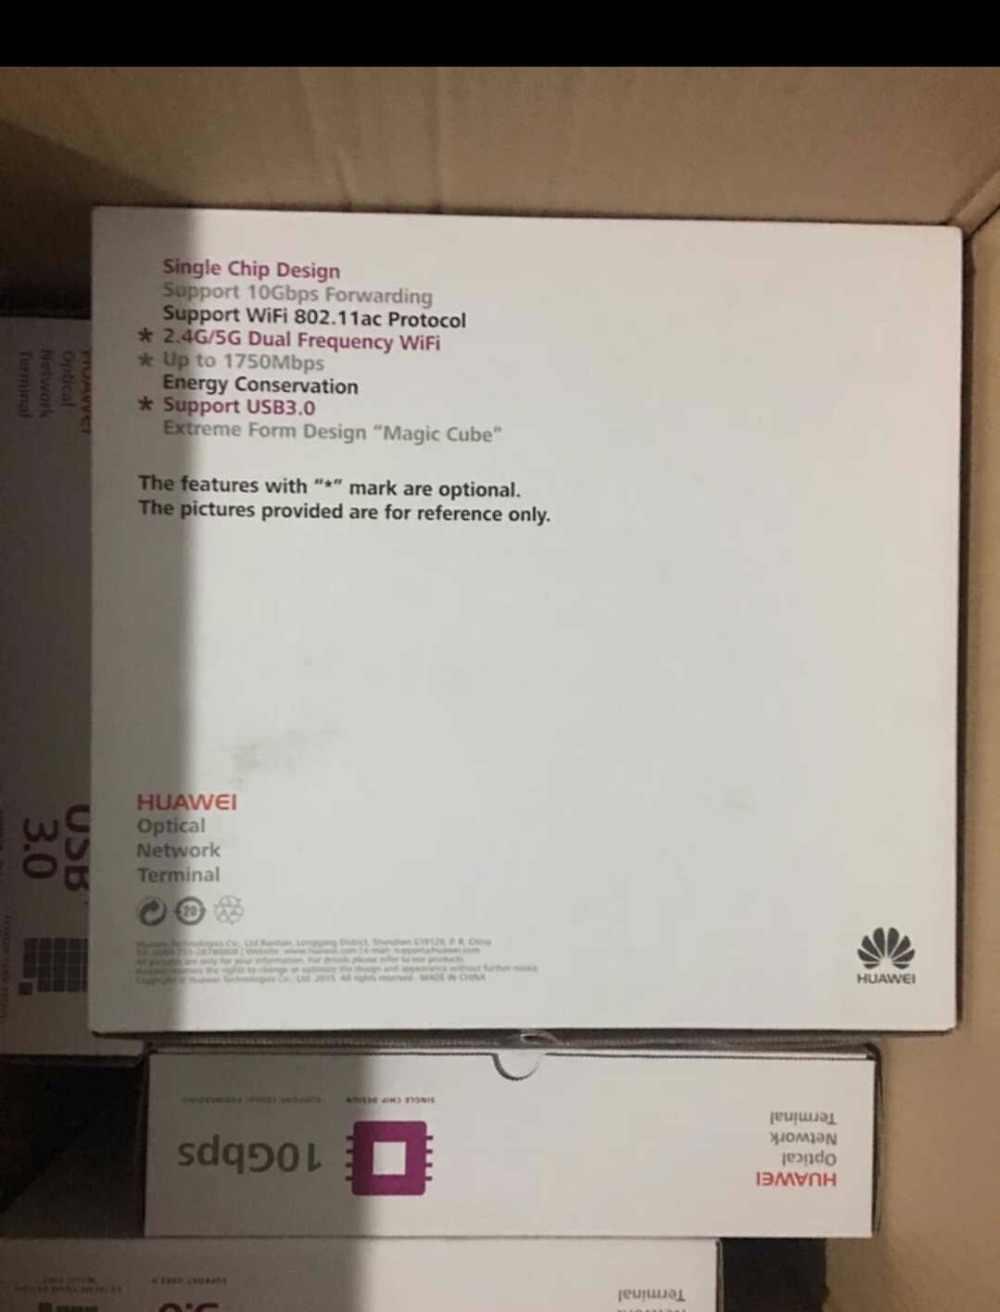 HUAWEI HG8245Q 2 POTS + 4GE + 2.4G/5G Wi-Fi + 2USB GPON ONT